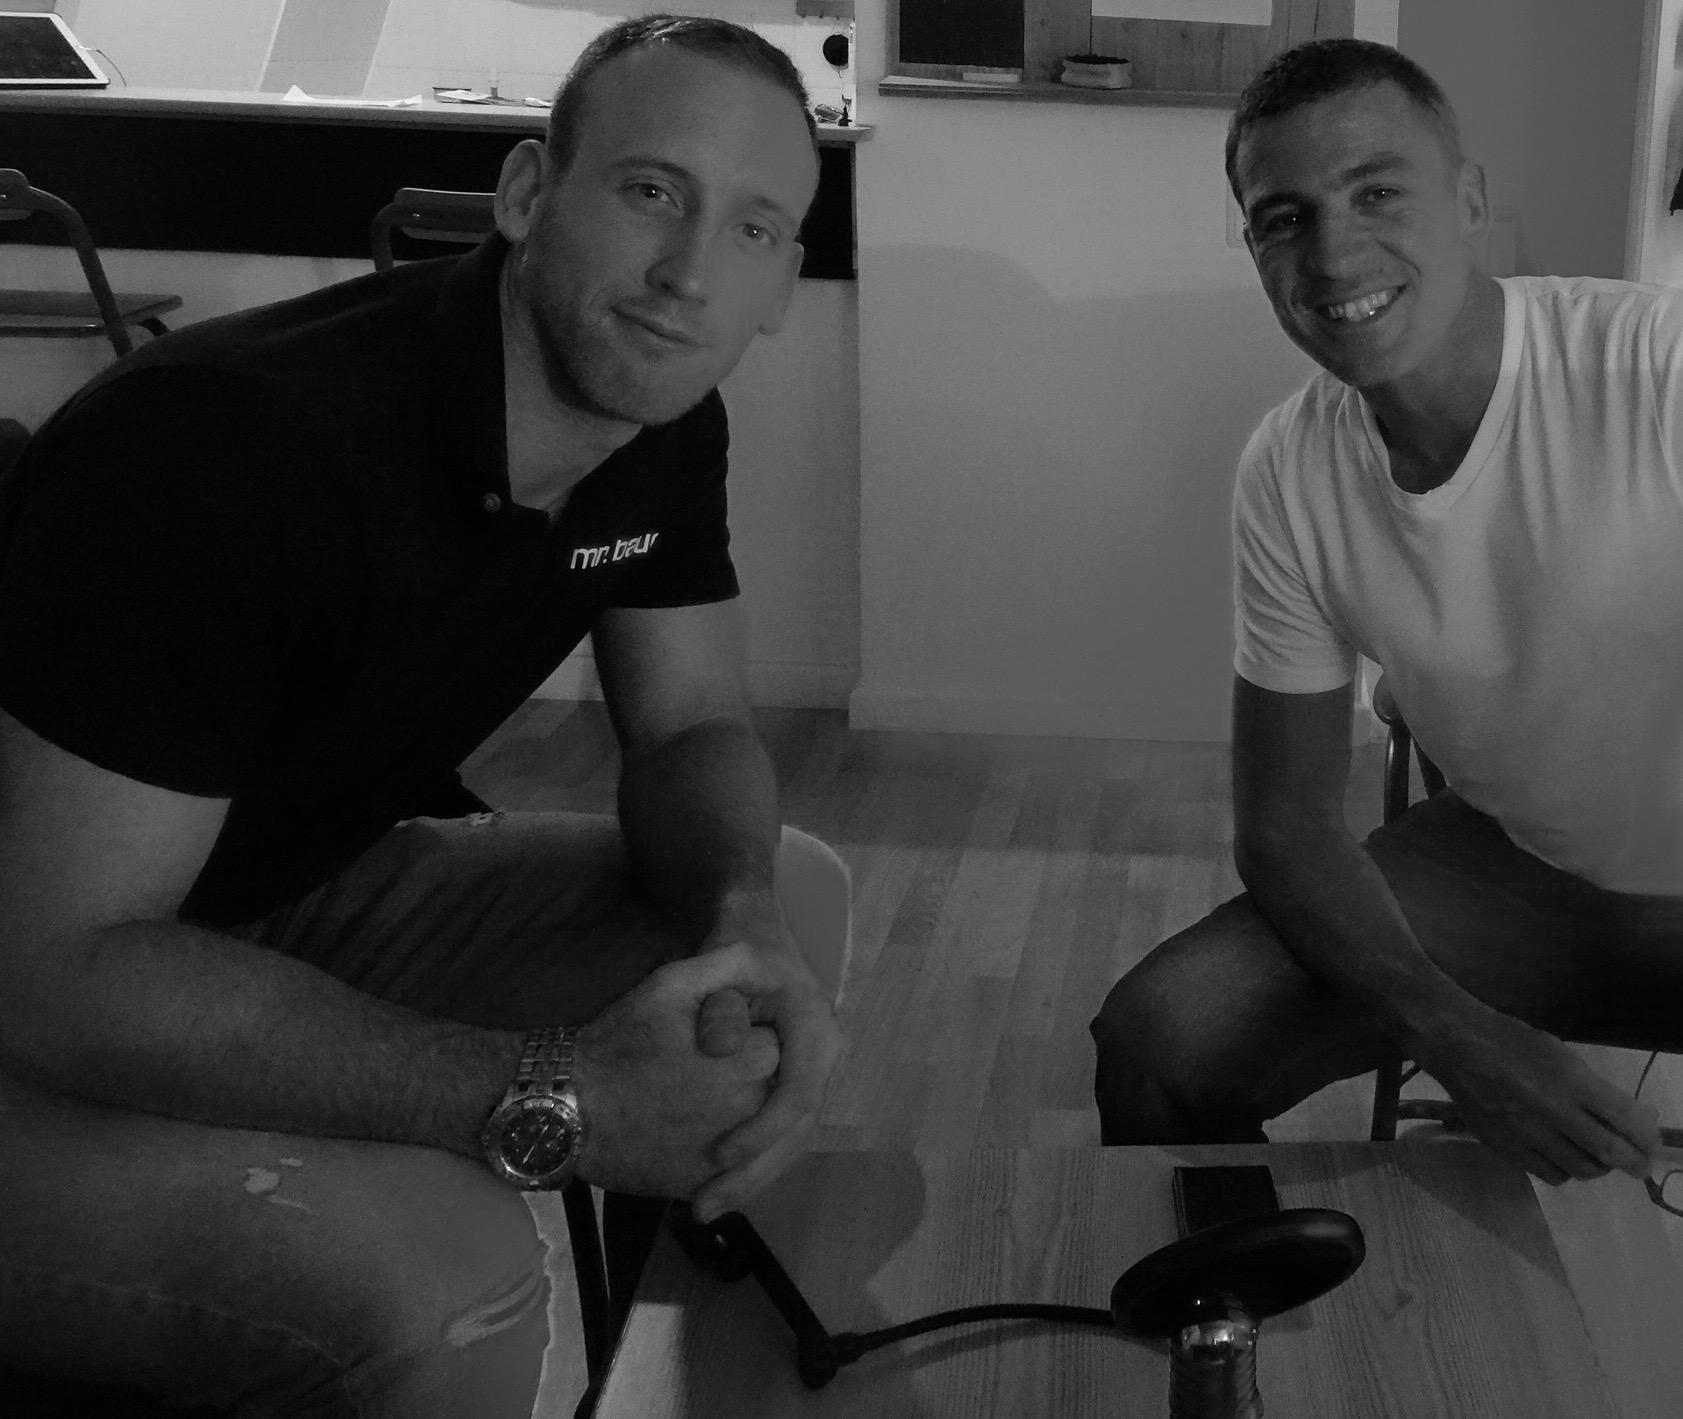 Podcast Nr. 1# Interview mit Chriss AKA Mr. Bauch